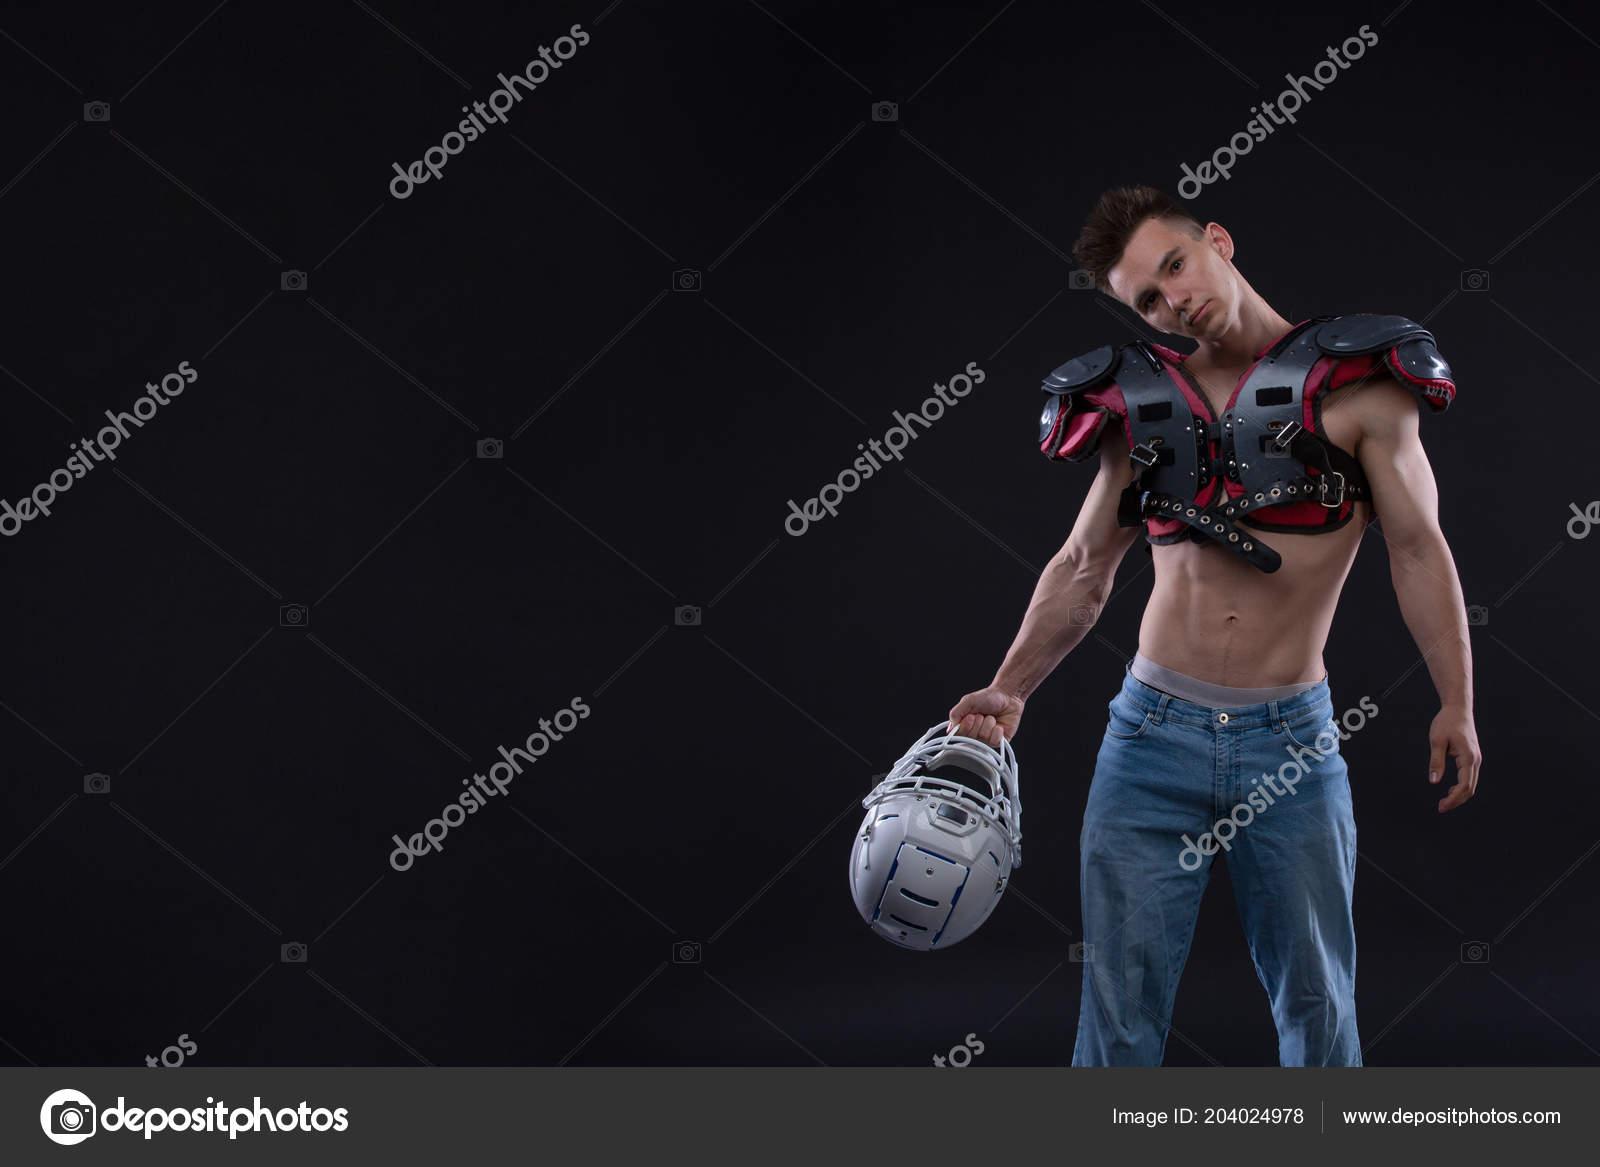 Sexy american football